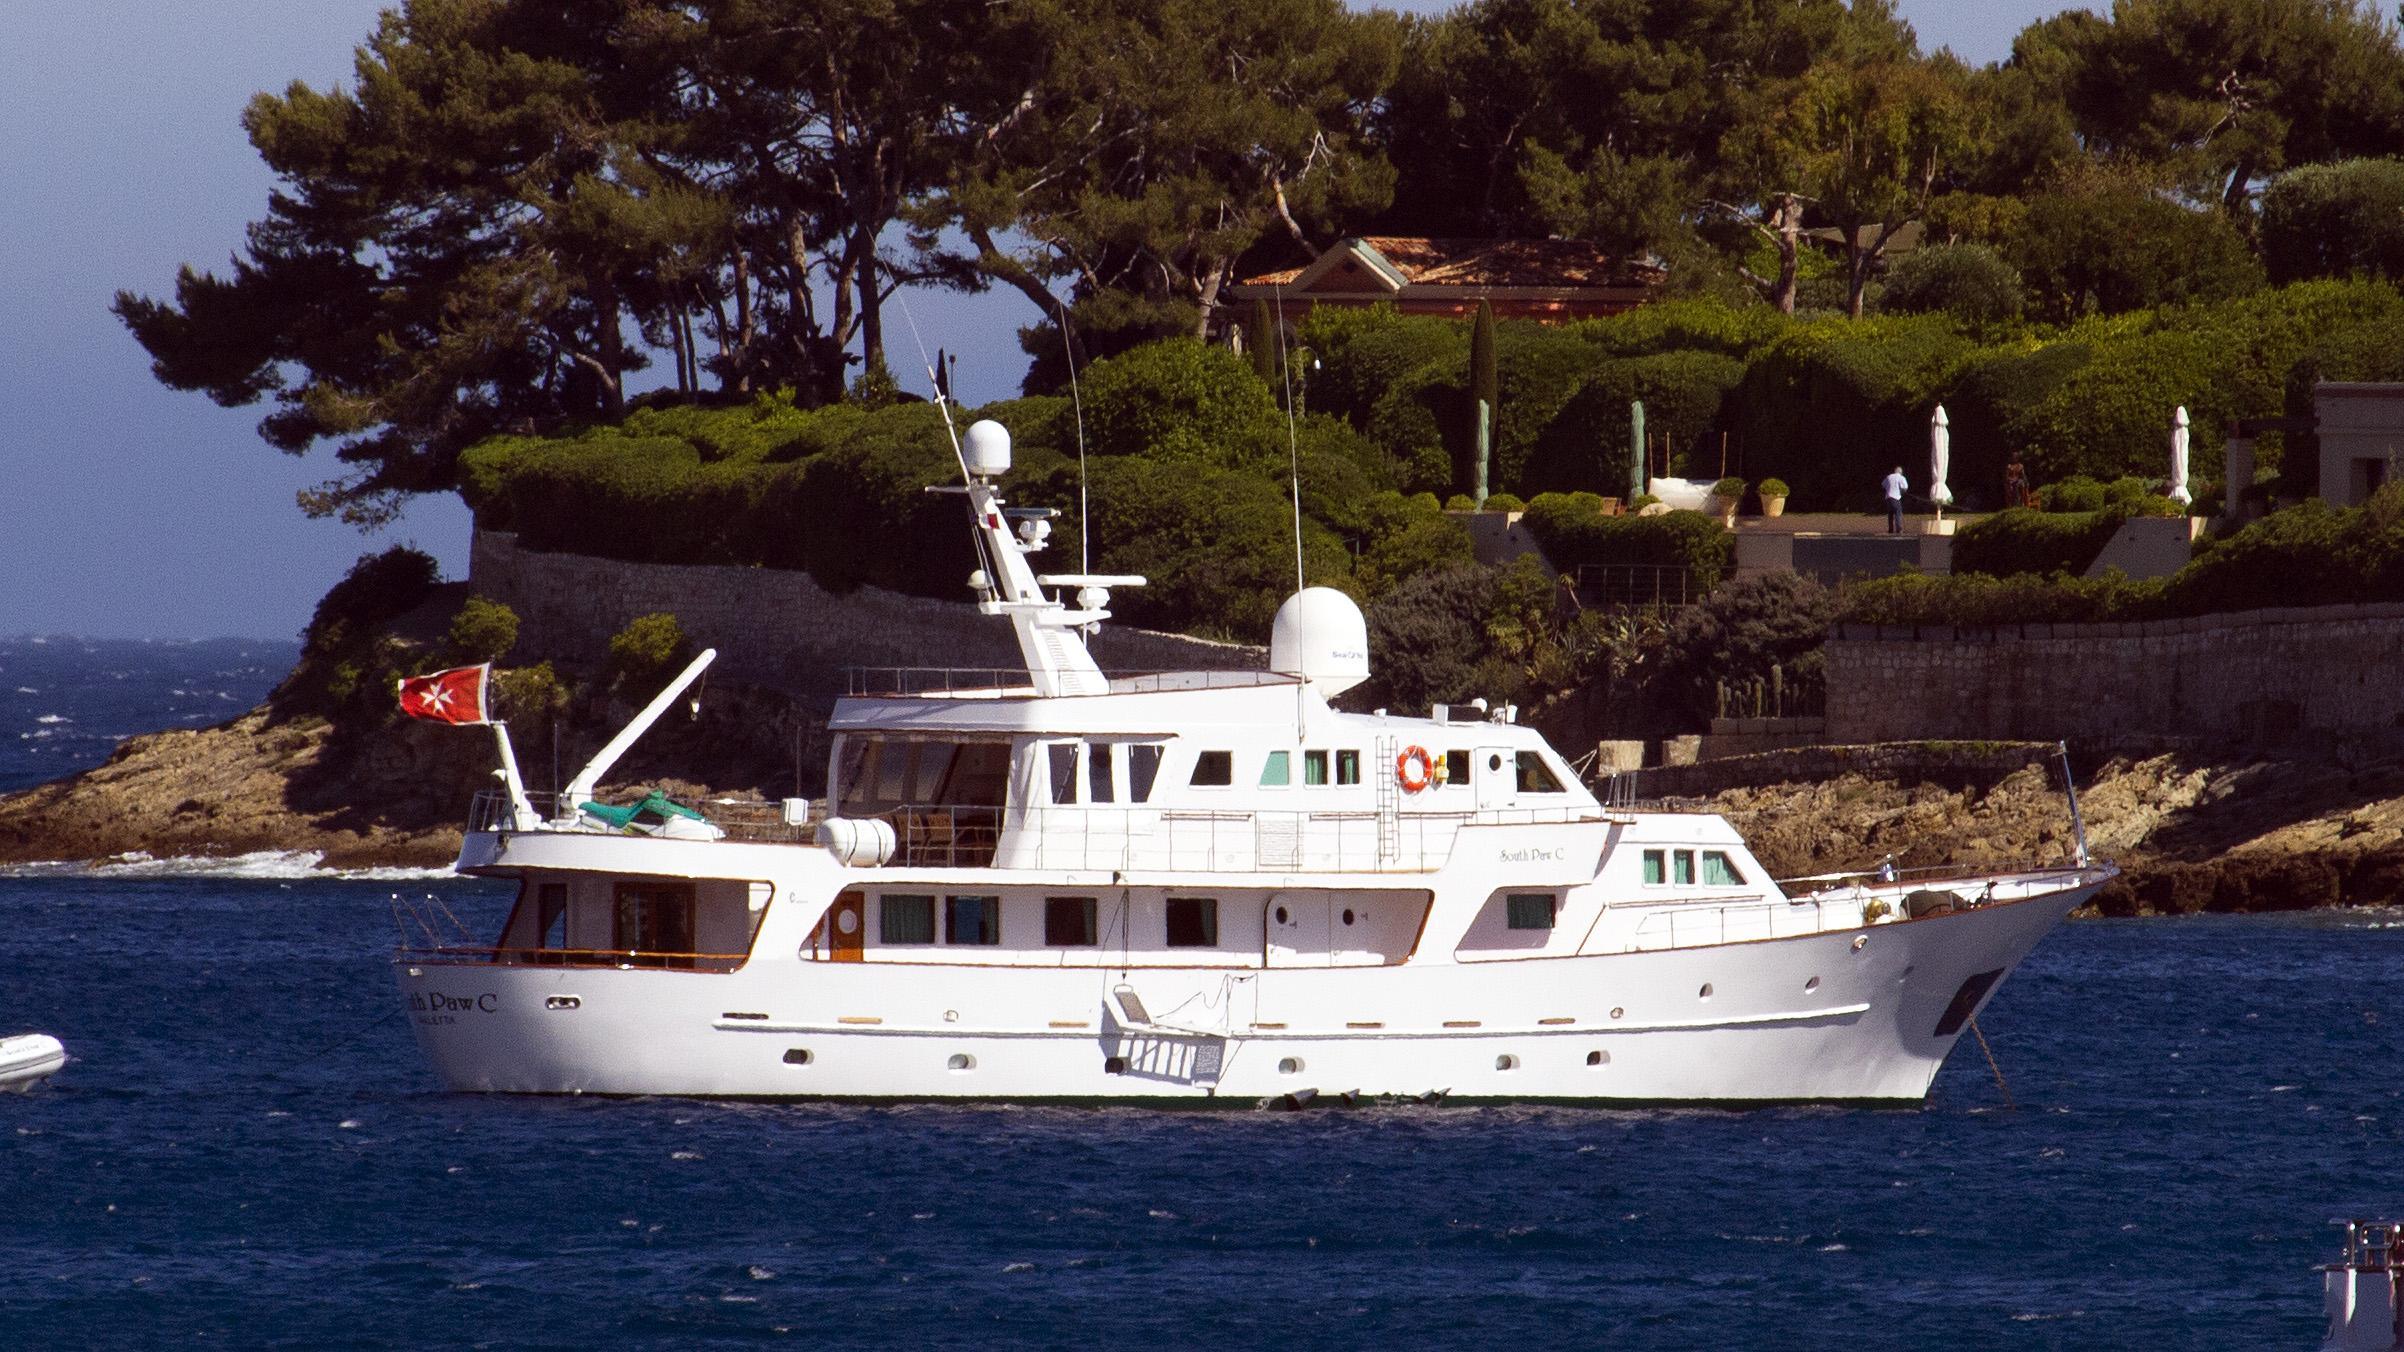 south-paw-c-motor-yacht-codecasa-1977-34m-half-stern